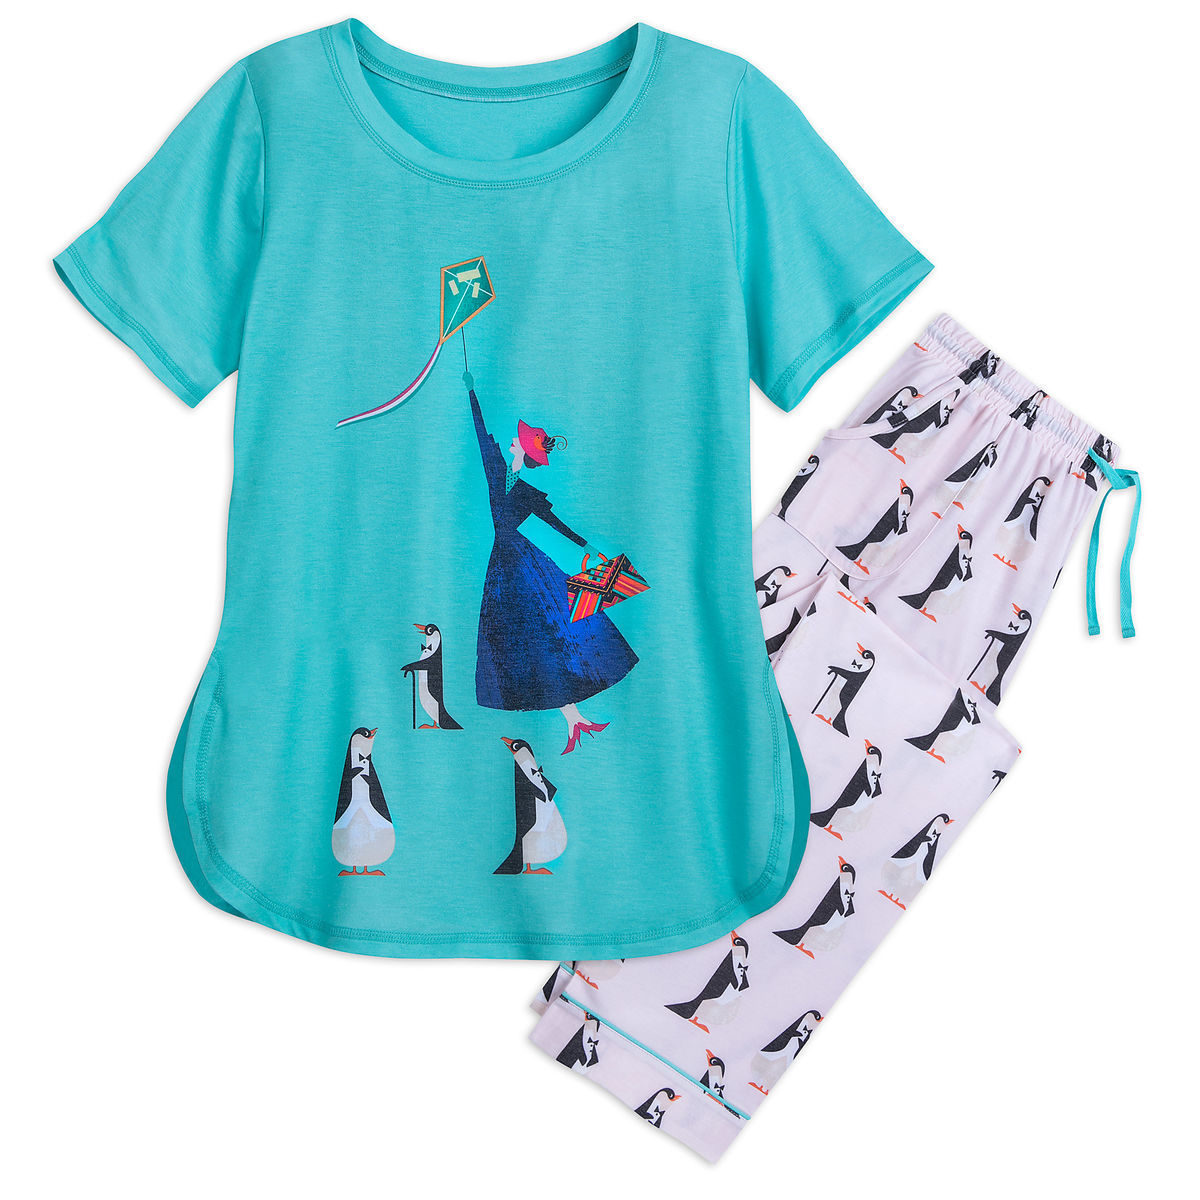 268eab2387b8 Mary Poppins Pajama Set for Women - Mary Poppins Returns